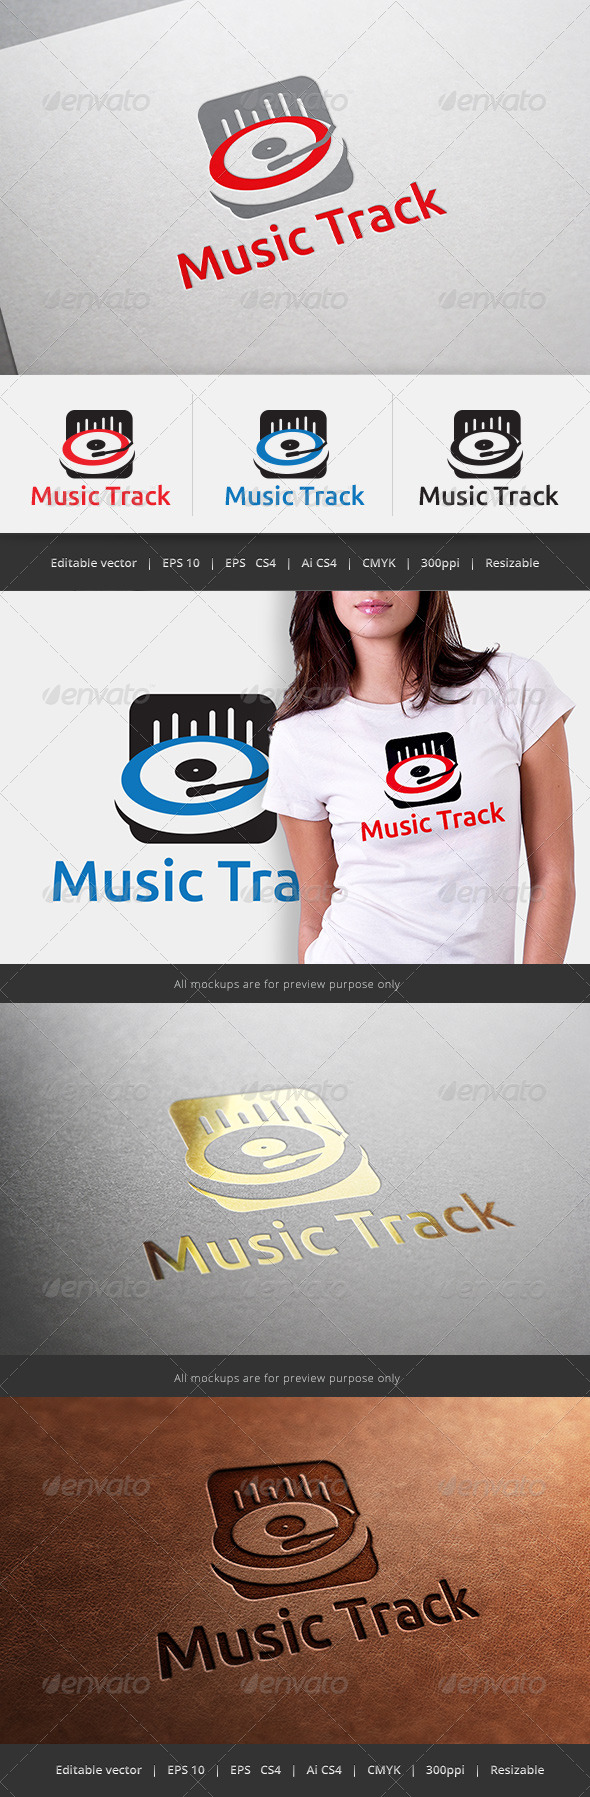 Music Track Logo